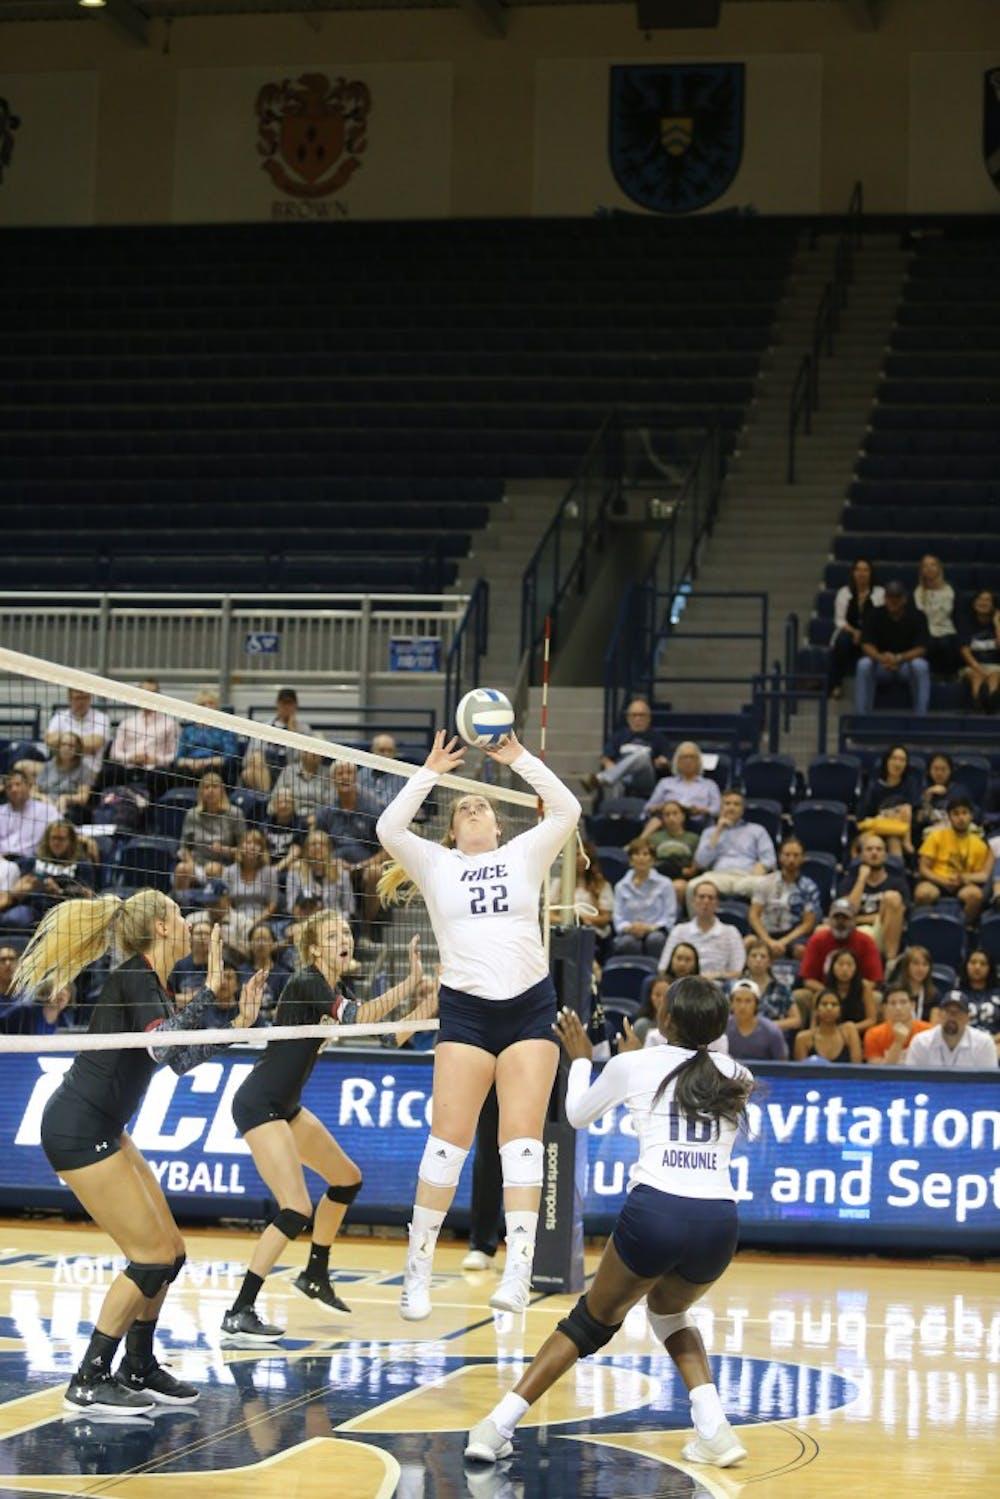 volleyball-cloris-cai